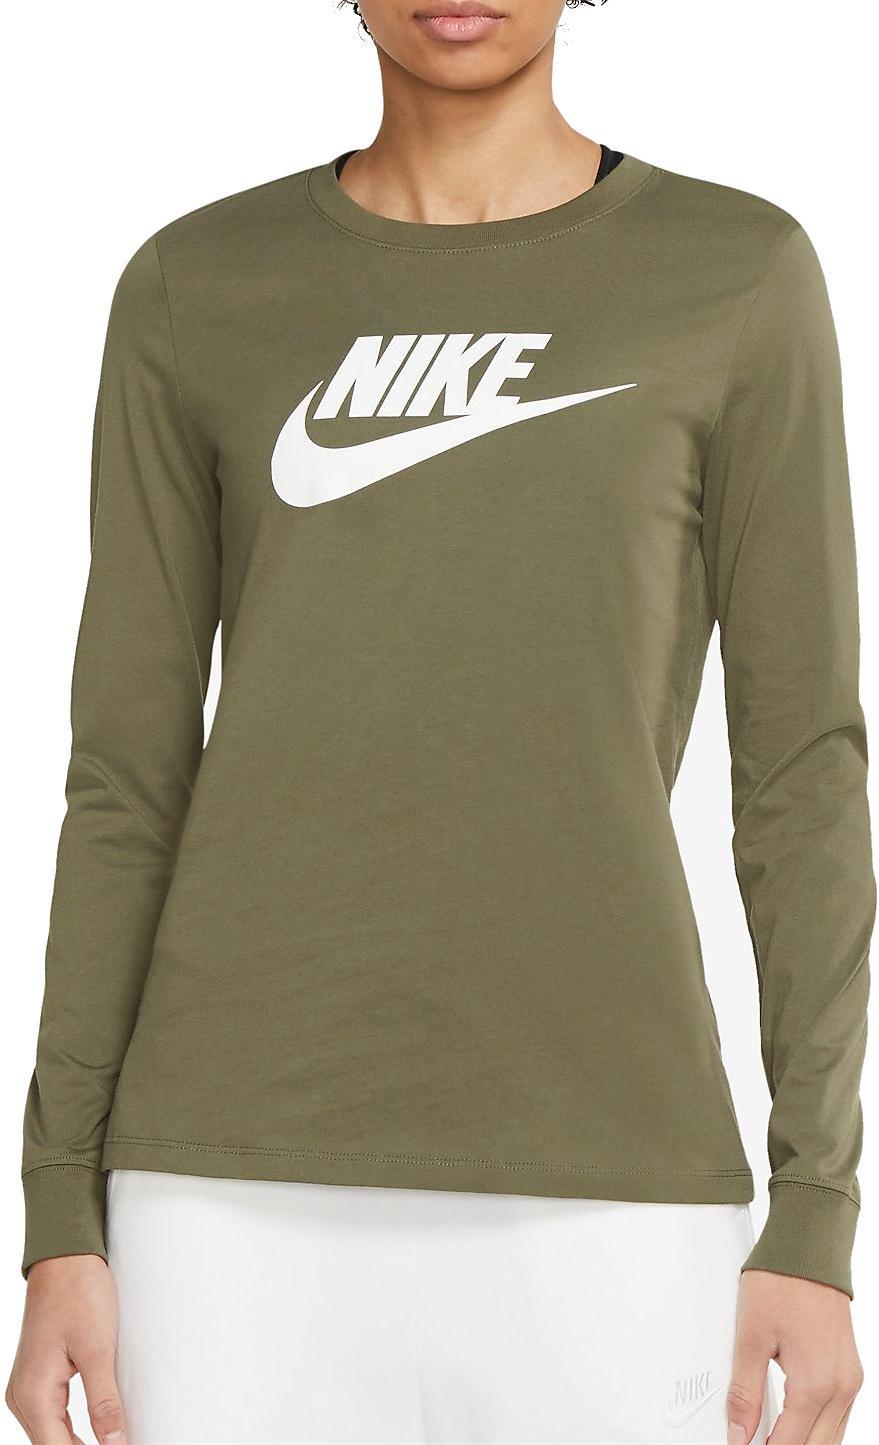 Tričko s dlhým rukávom Nike Sportswear Women s Long-Sleeve T-Shirt